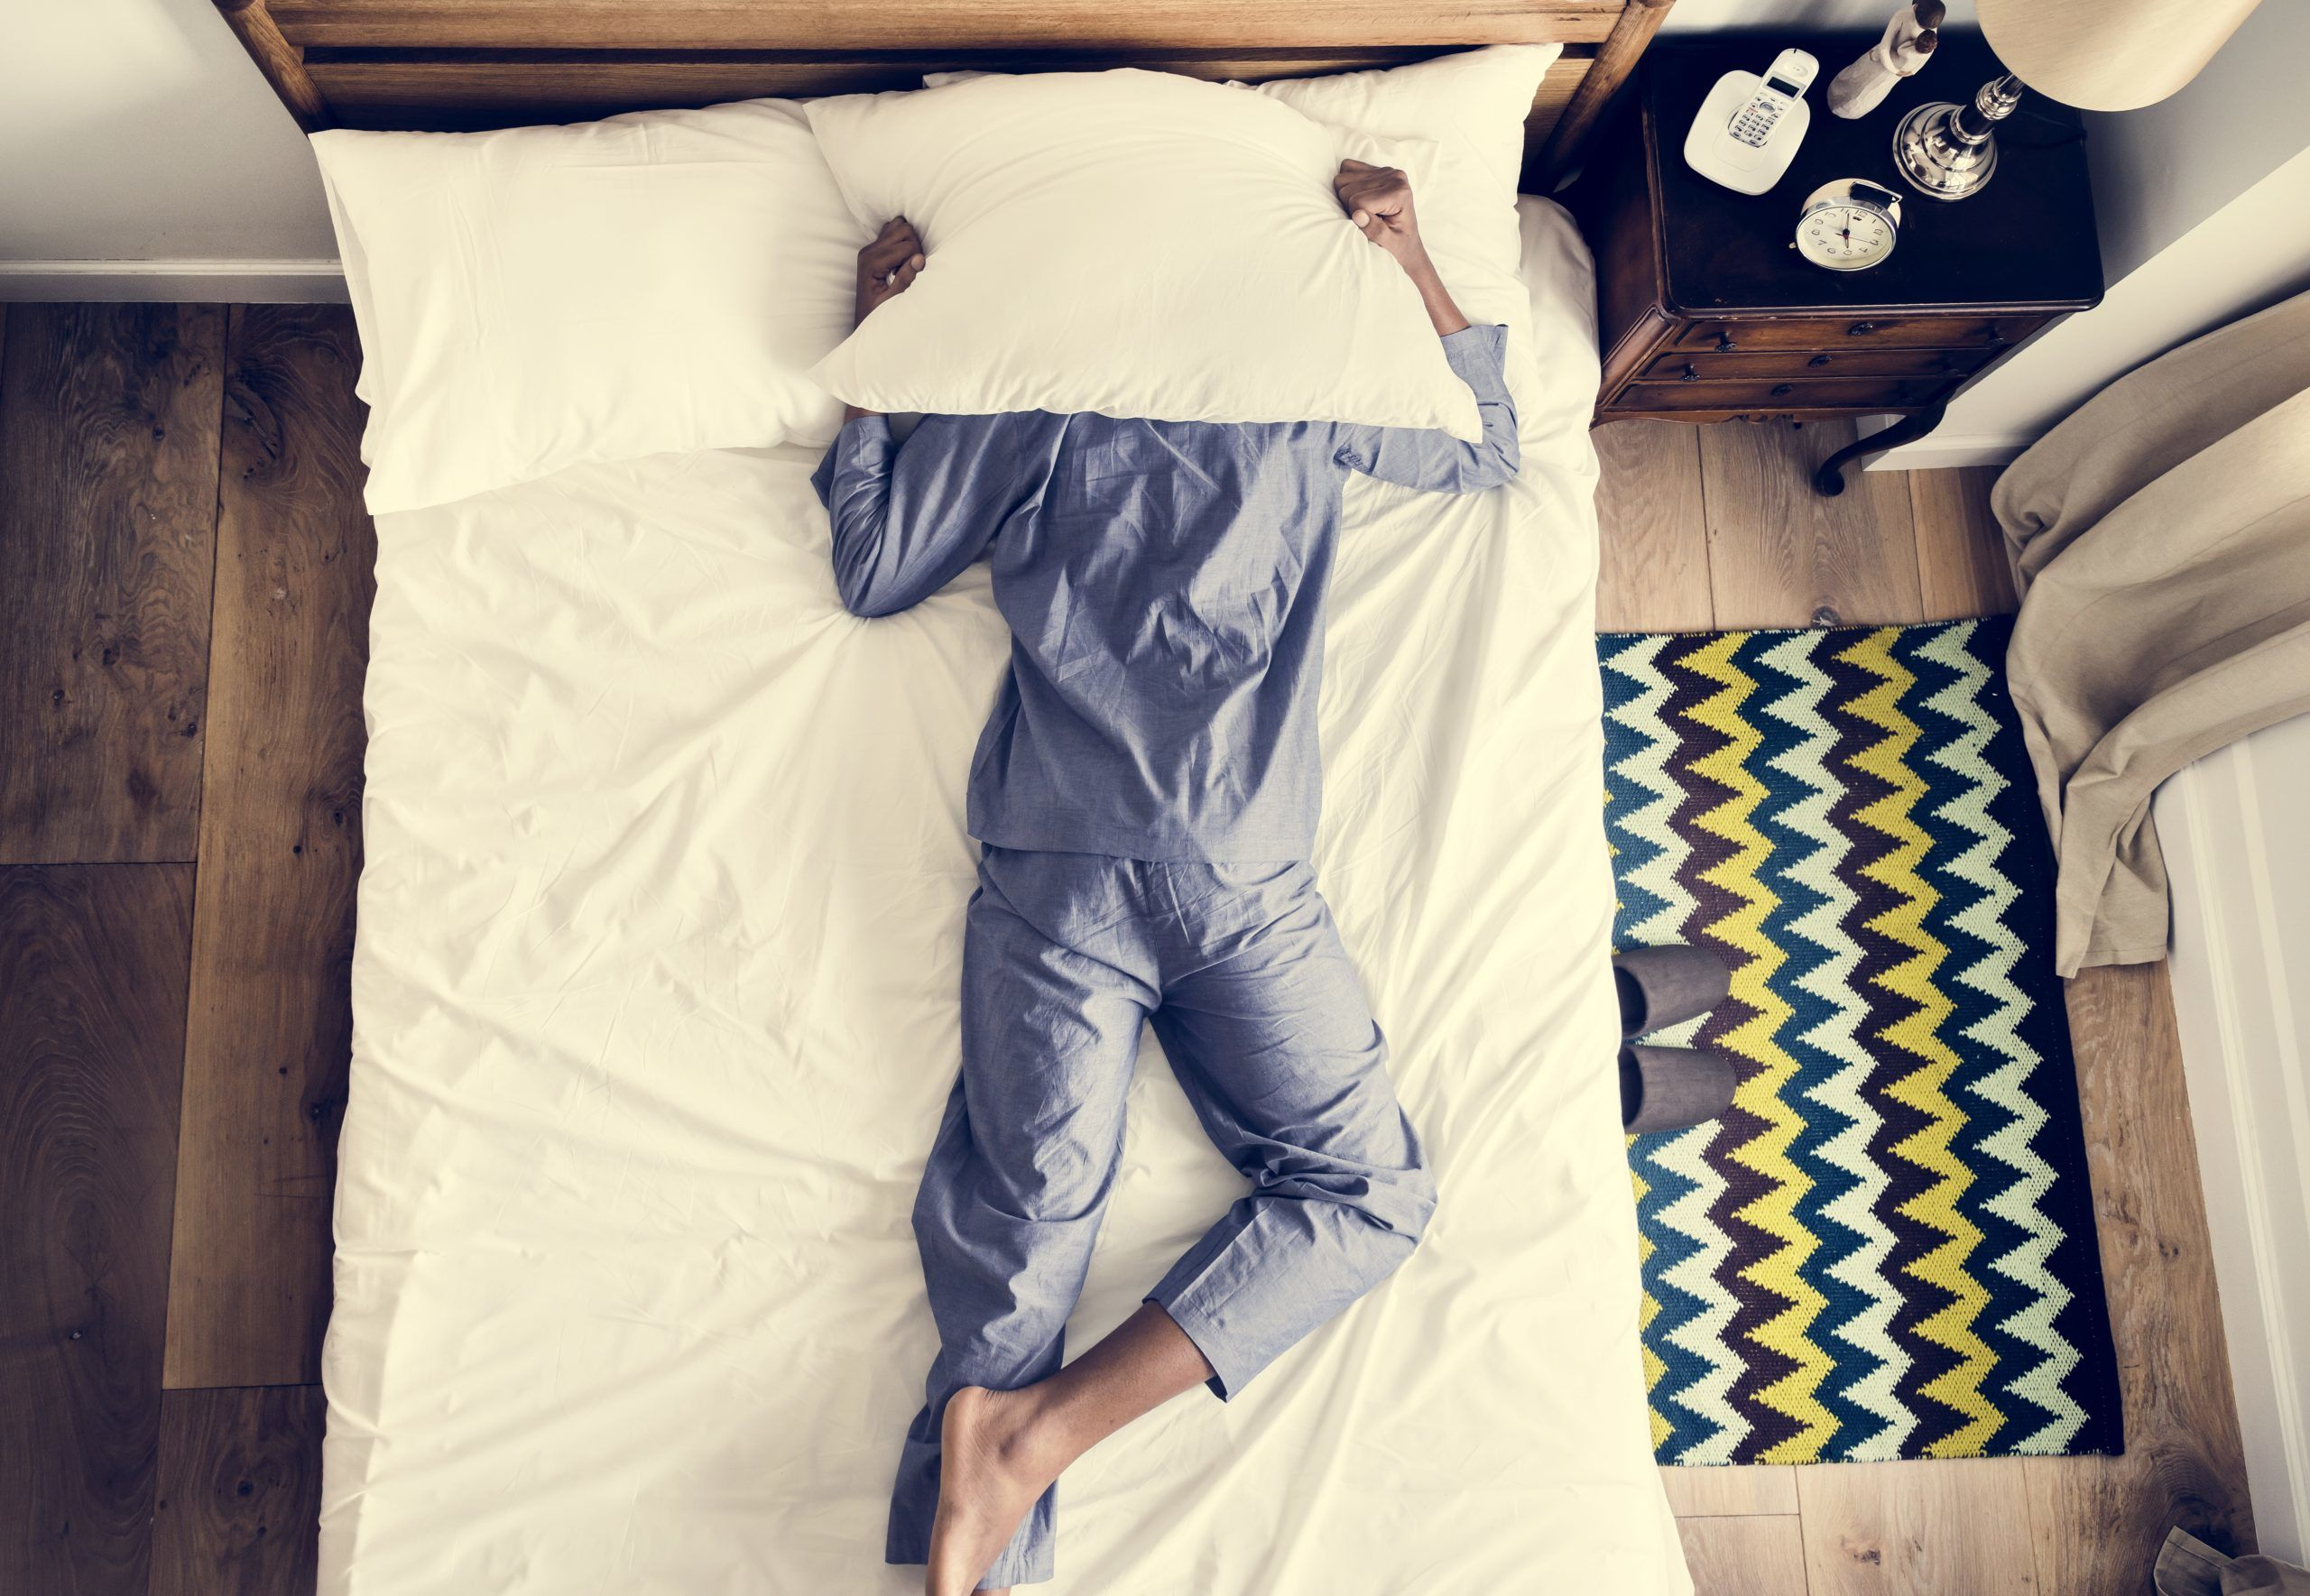 Man with sleep apnea on bed